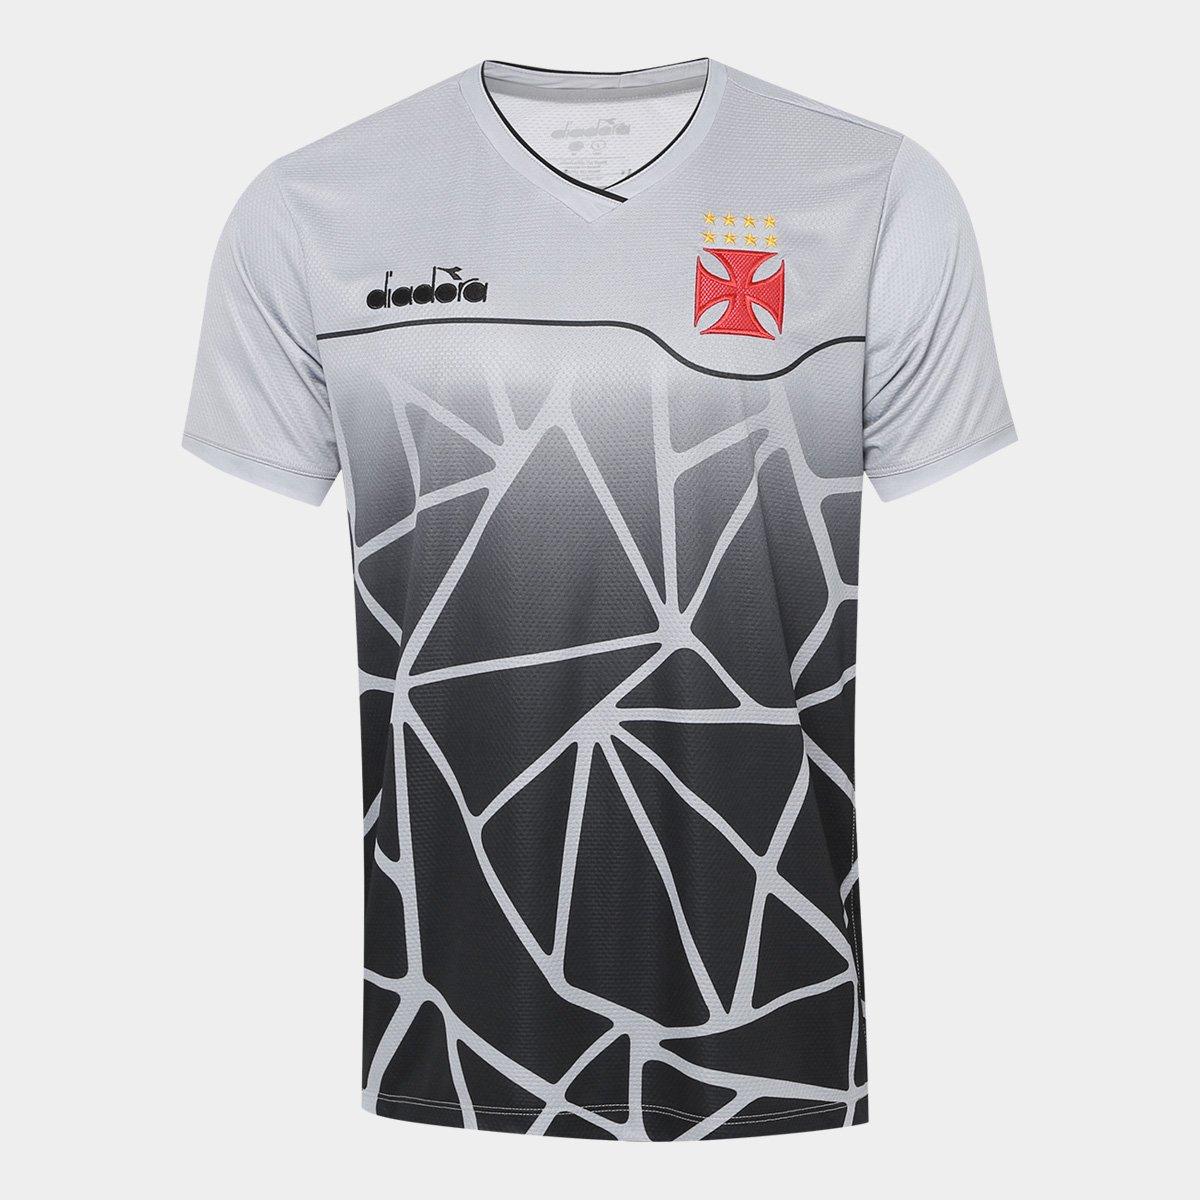 5775d2e1b0 Camisa Vasco Treino 2018 Diadora Masculina | Shop Vasco